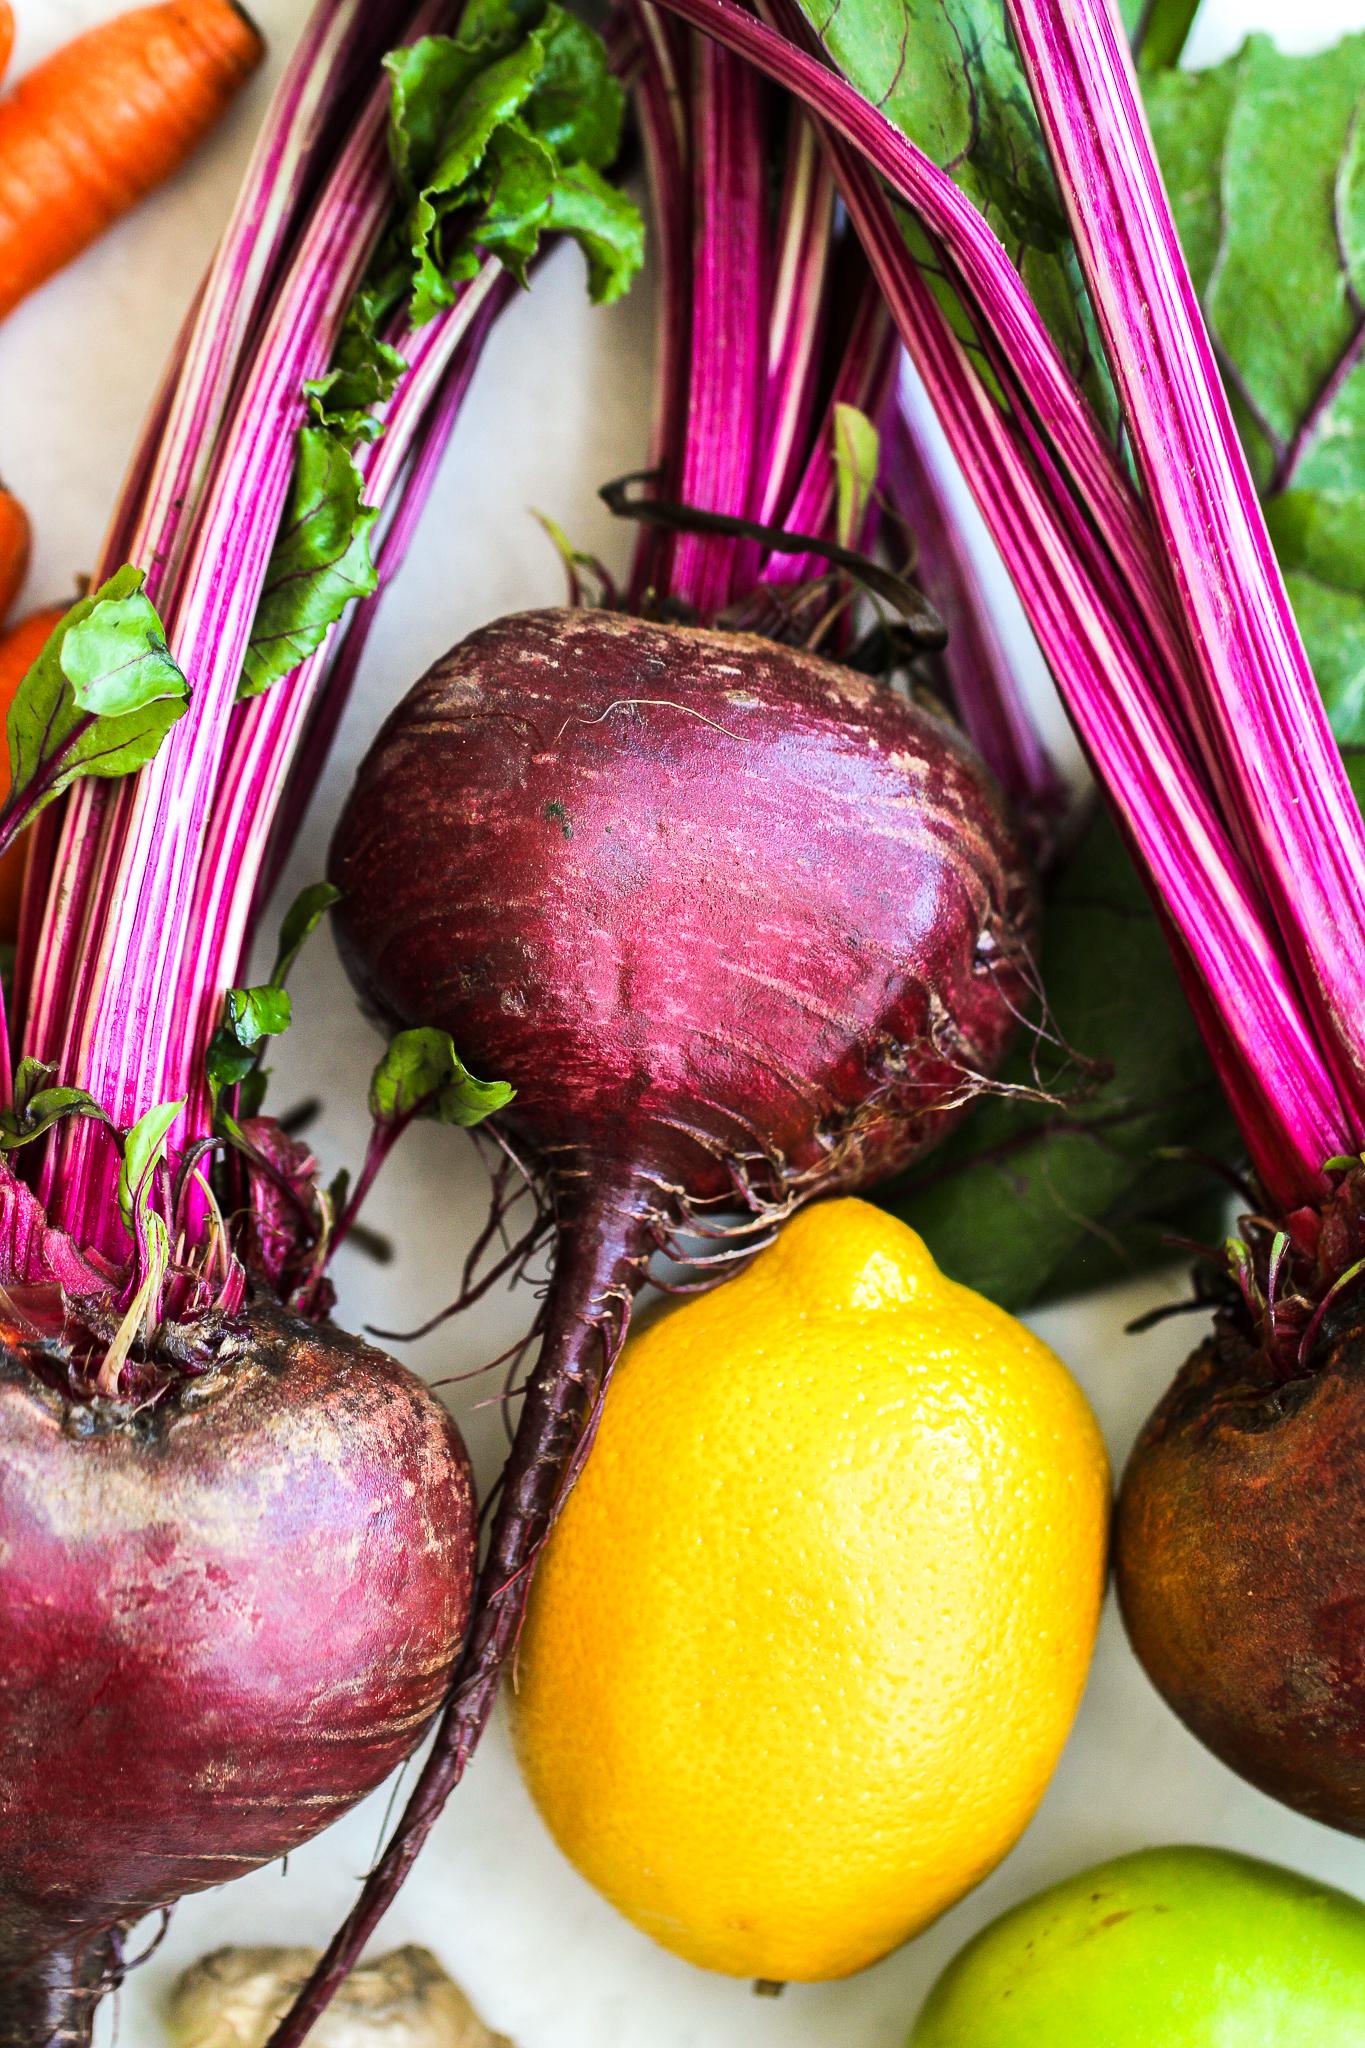 beautiful flat lay of fresh produce, lovely purple beets, bright yellow lemon, green apple and fresh carrots